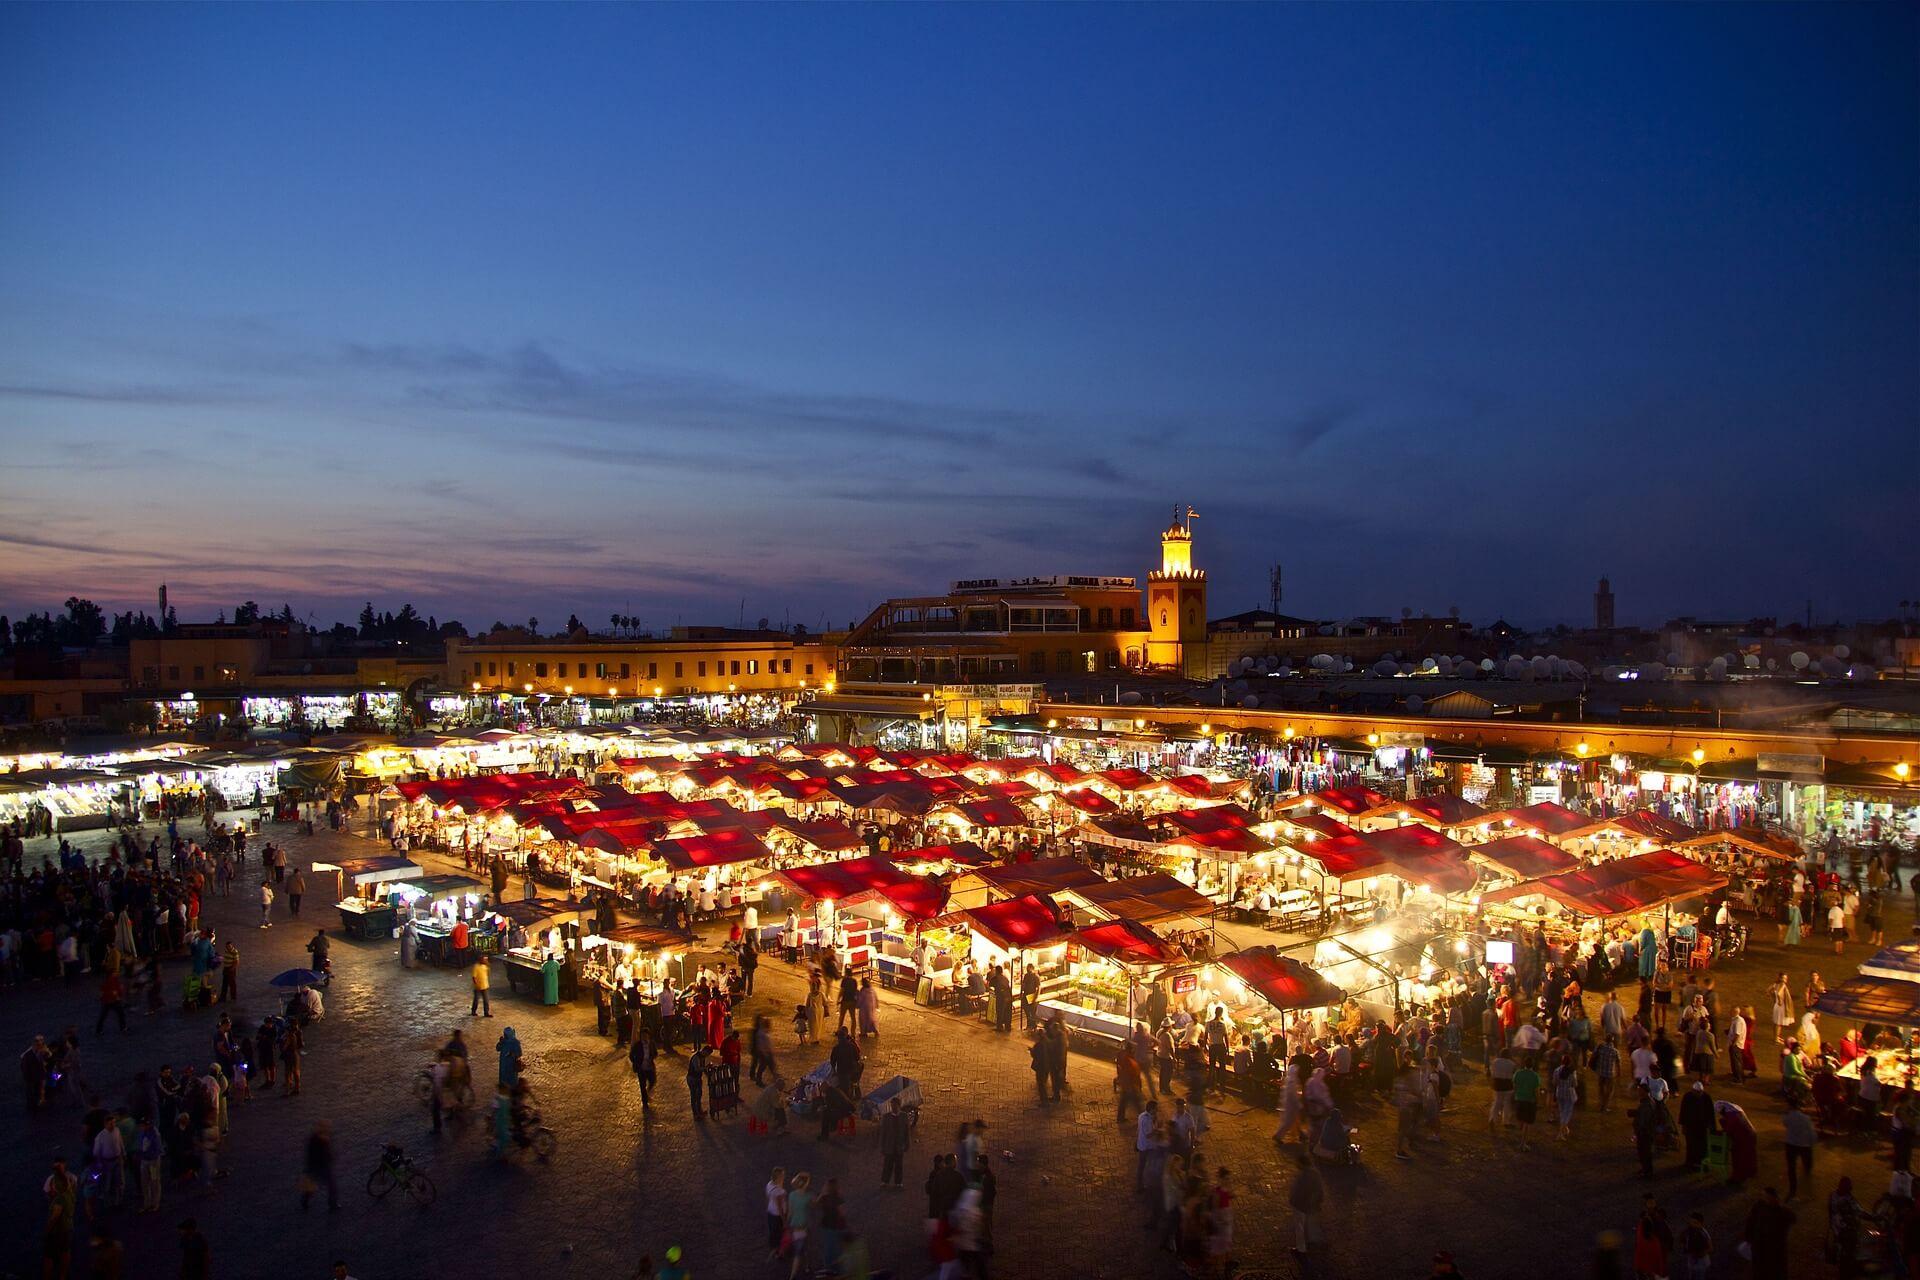 Sahara Desert Tour - Get To Know Morocco - Marrakech